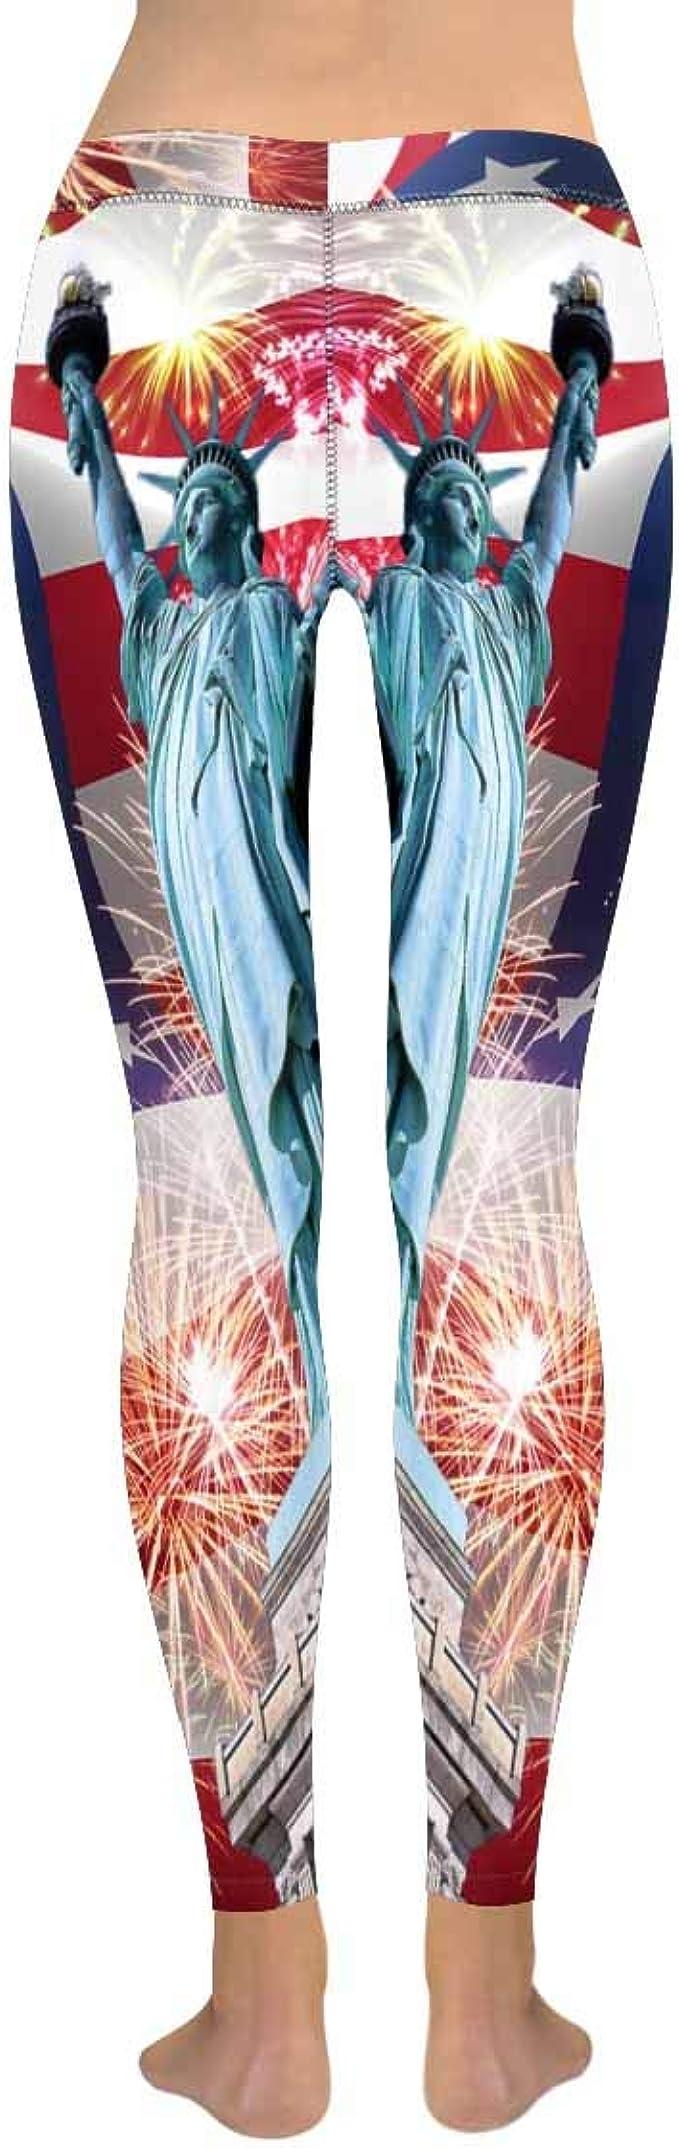 XXS-5XL InterestPrint Womens Soft Slim Leggings Geometry Space Running Workout Active Leggings